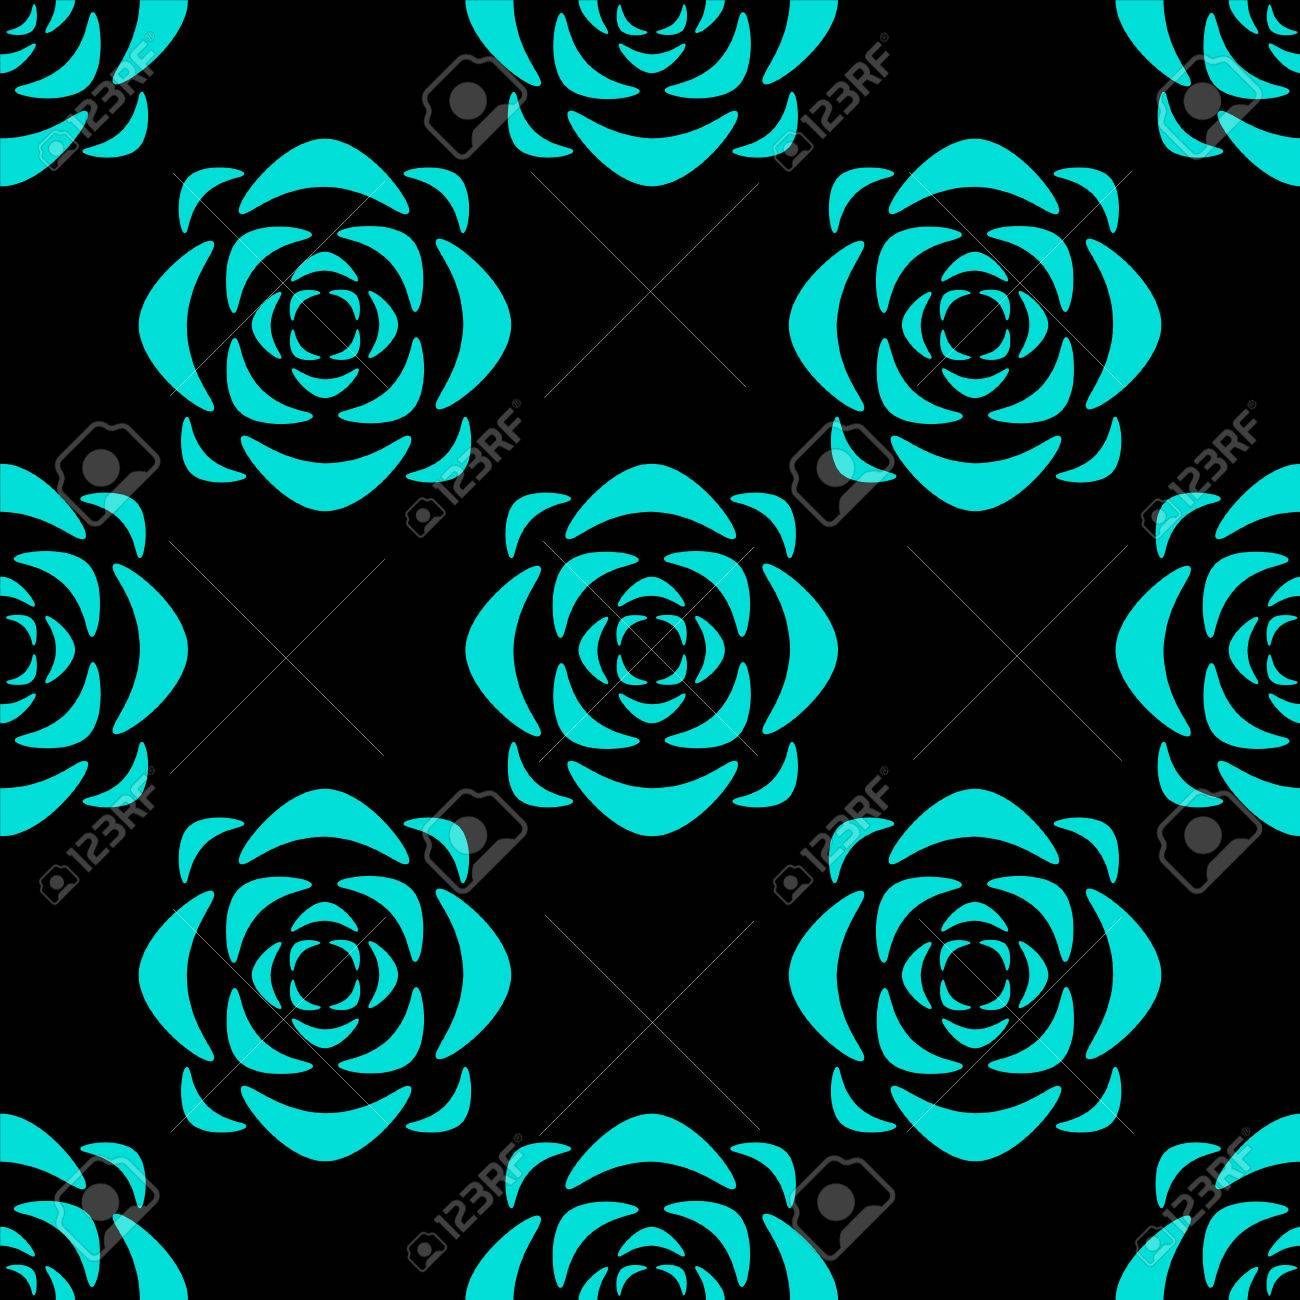 Seamless pattern with silhouettes lotus flowers abstract floral seamless pattern with silhouettes lotus flowers abstract floral background endless print texture fabric mightylinksfo